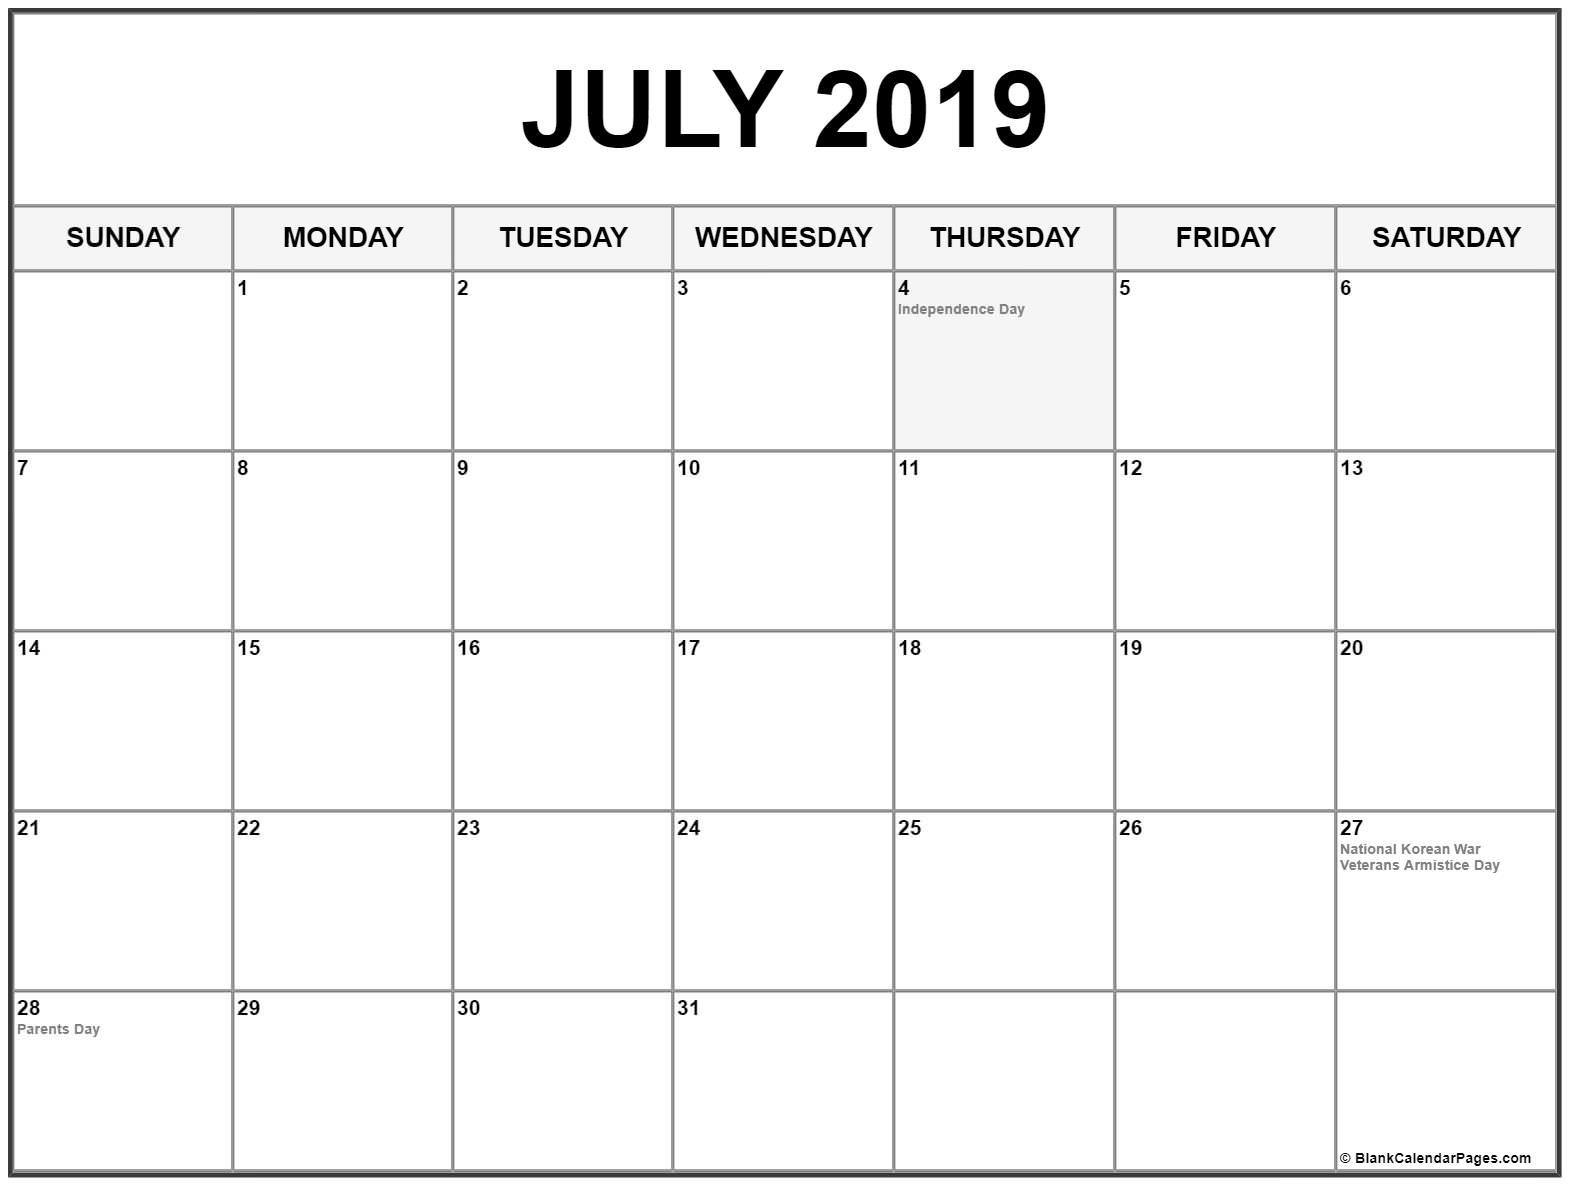 July 2019 Calendar With Holidays #july #july2019 #julycalendar2019 for July Calendar Printable Template